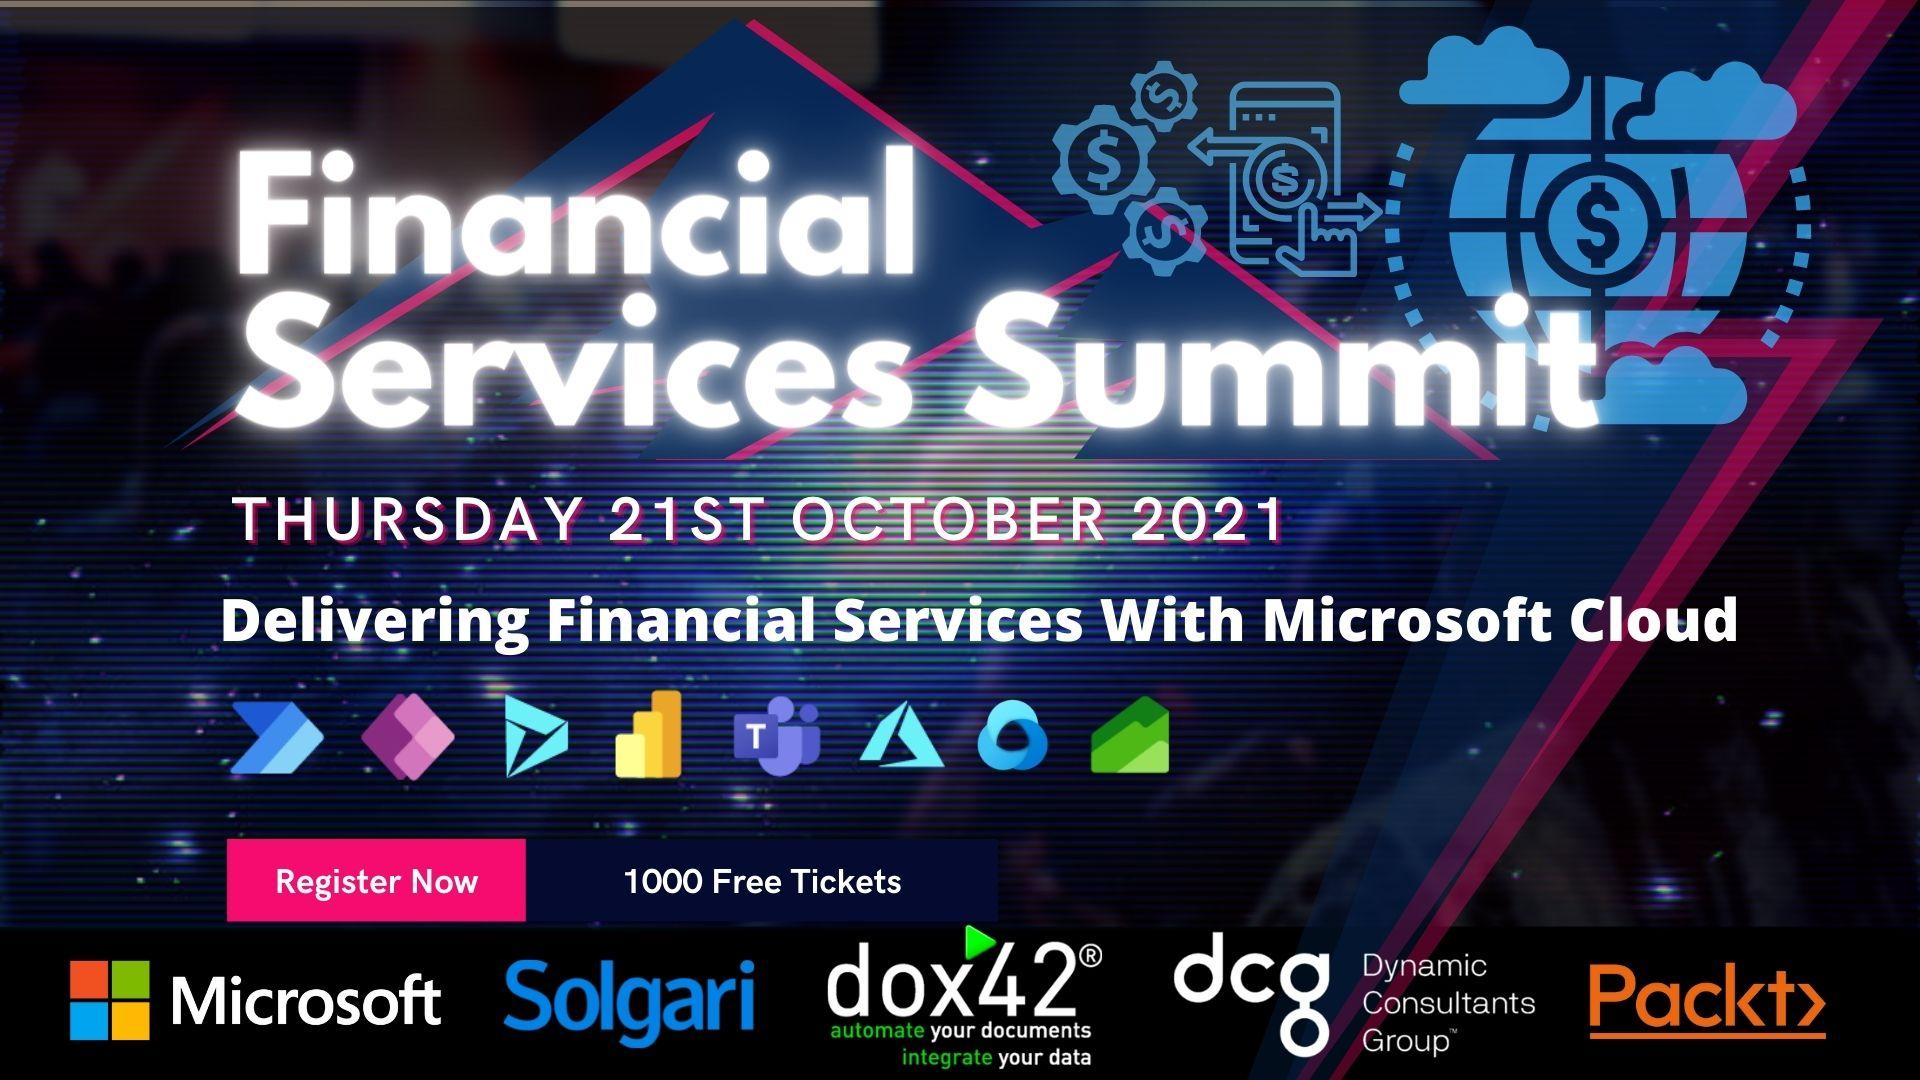 Financial Services Summit 2021